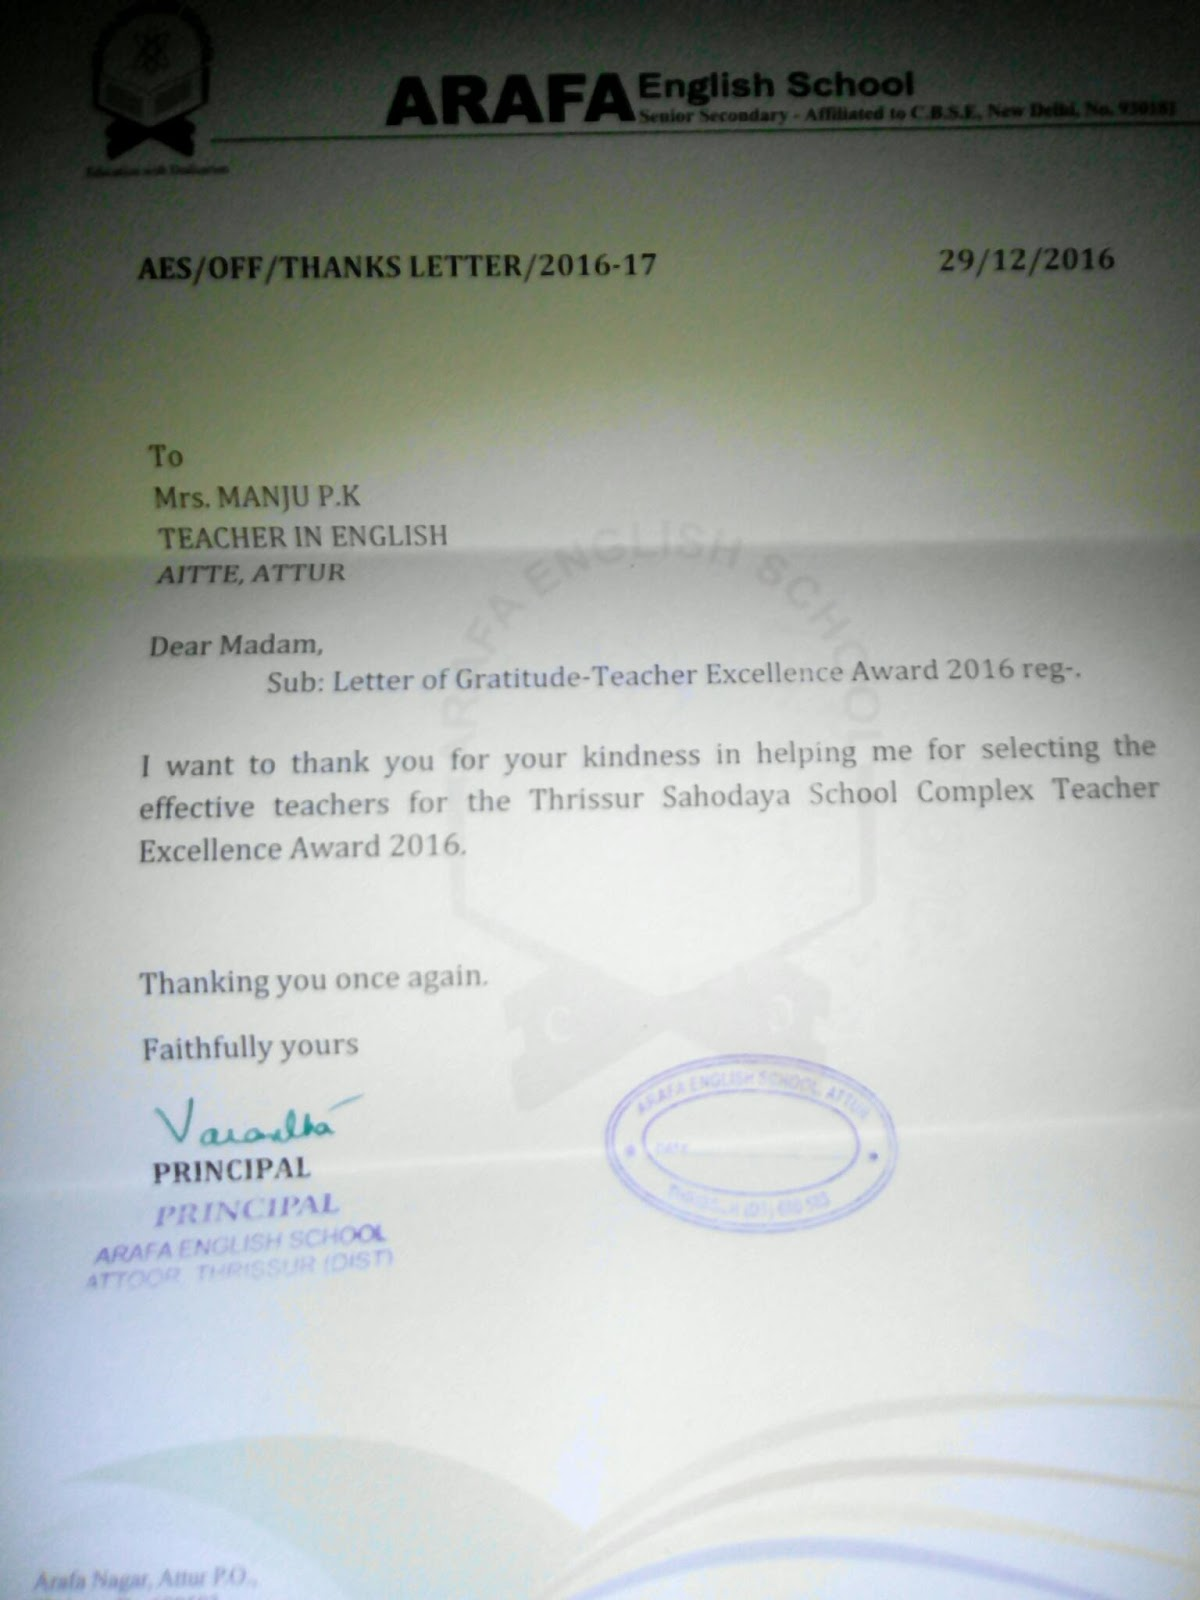 Silent Tears An Appreciation Letter From Arafa School Principal For